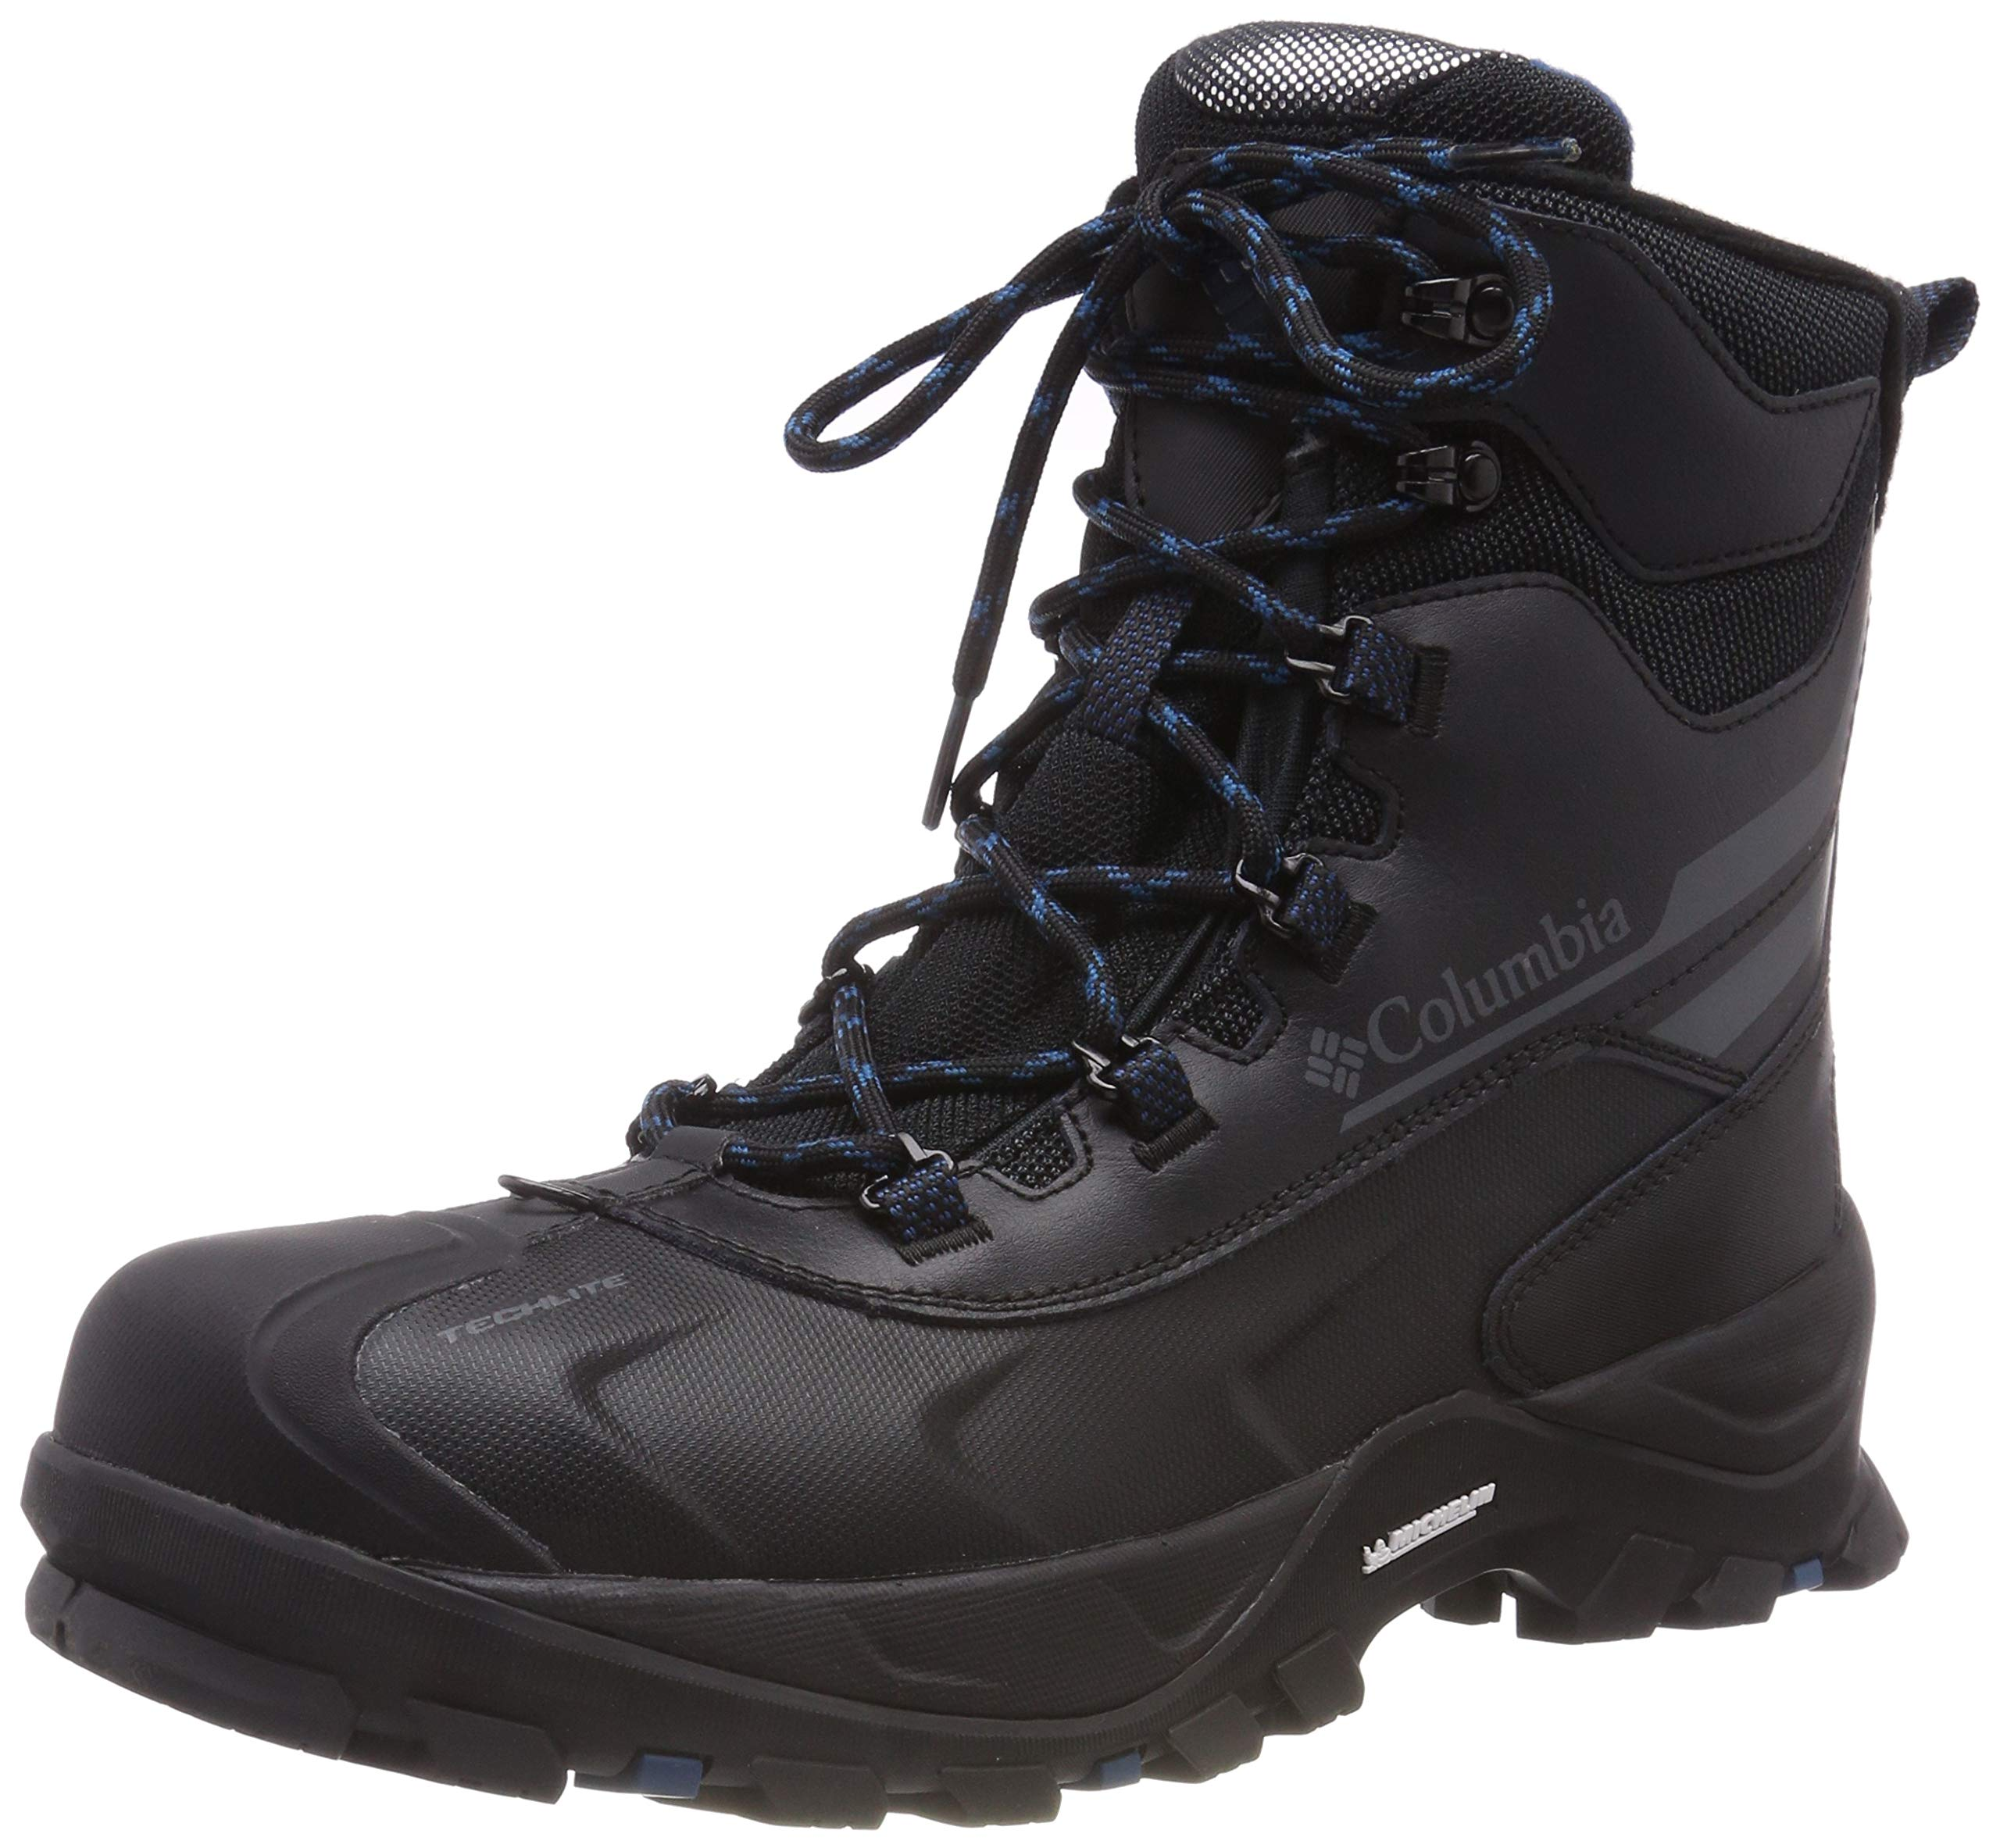 c8c366687da Best Rated in Men's Snow Boots & Helpful Customer Reviews - Amazon.com